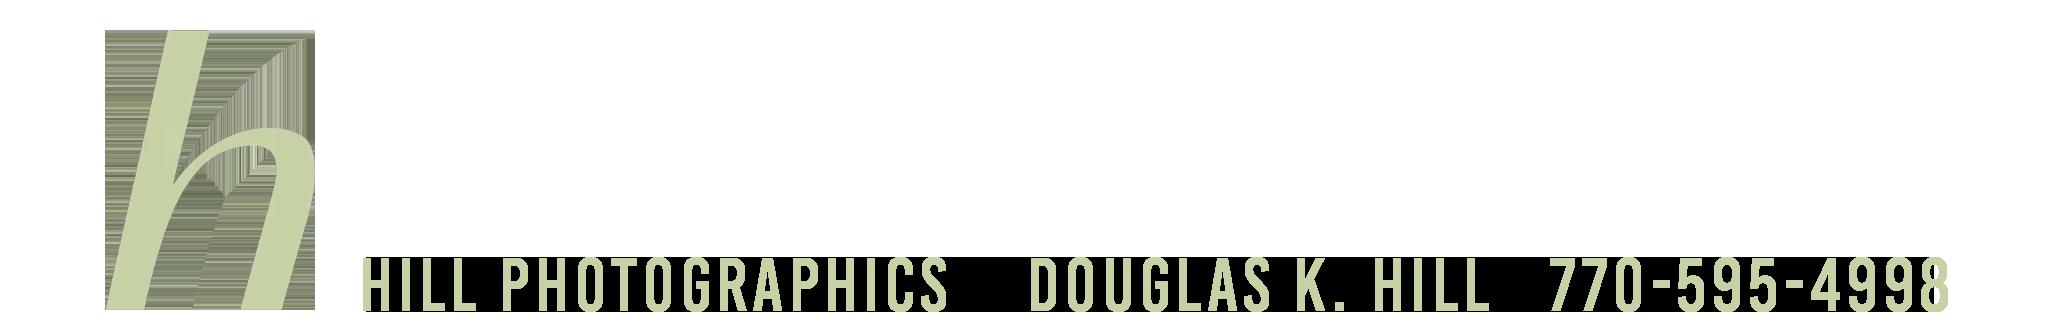 Douglas Hill Photography